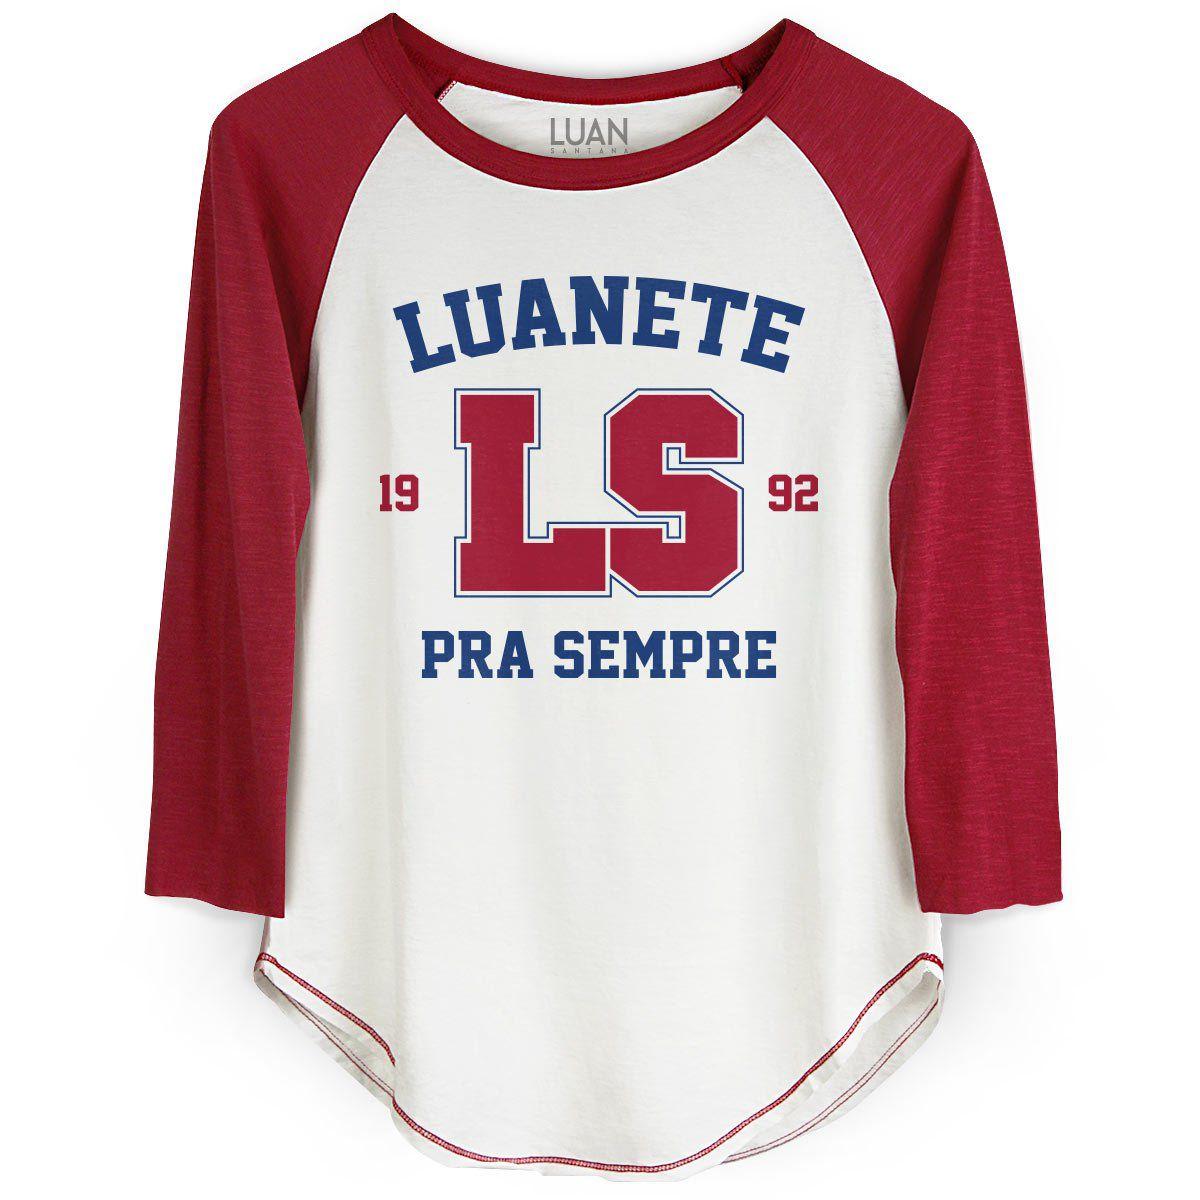 Camiseta Raglan Feminina Luan Santana LS 1992  - bandUP Store Marketplace